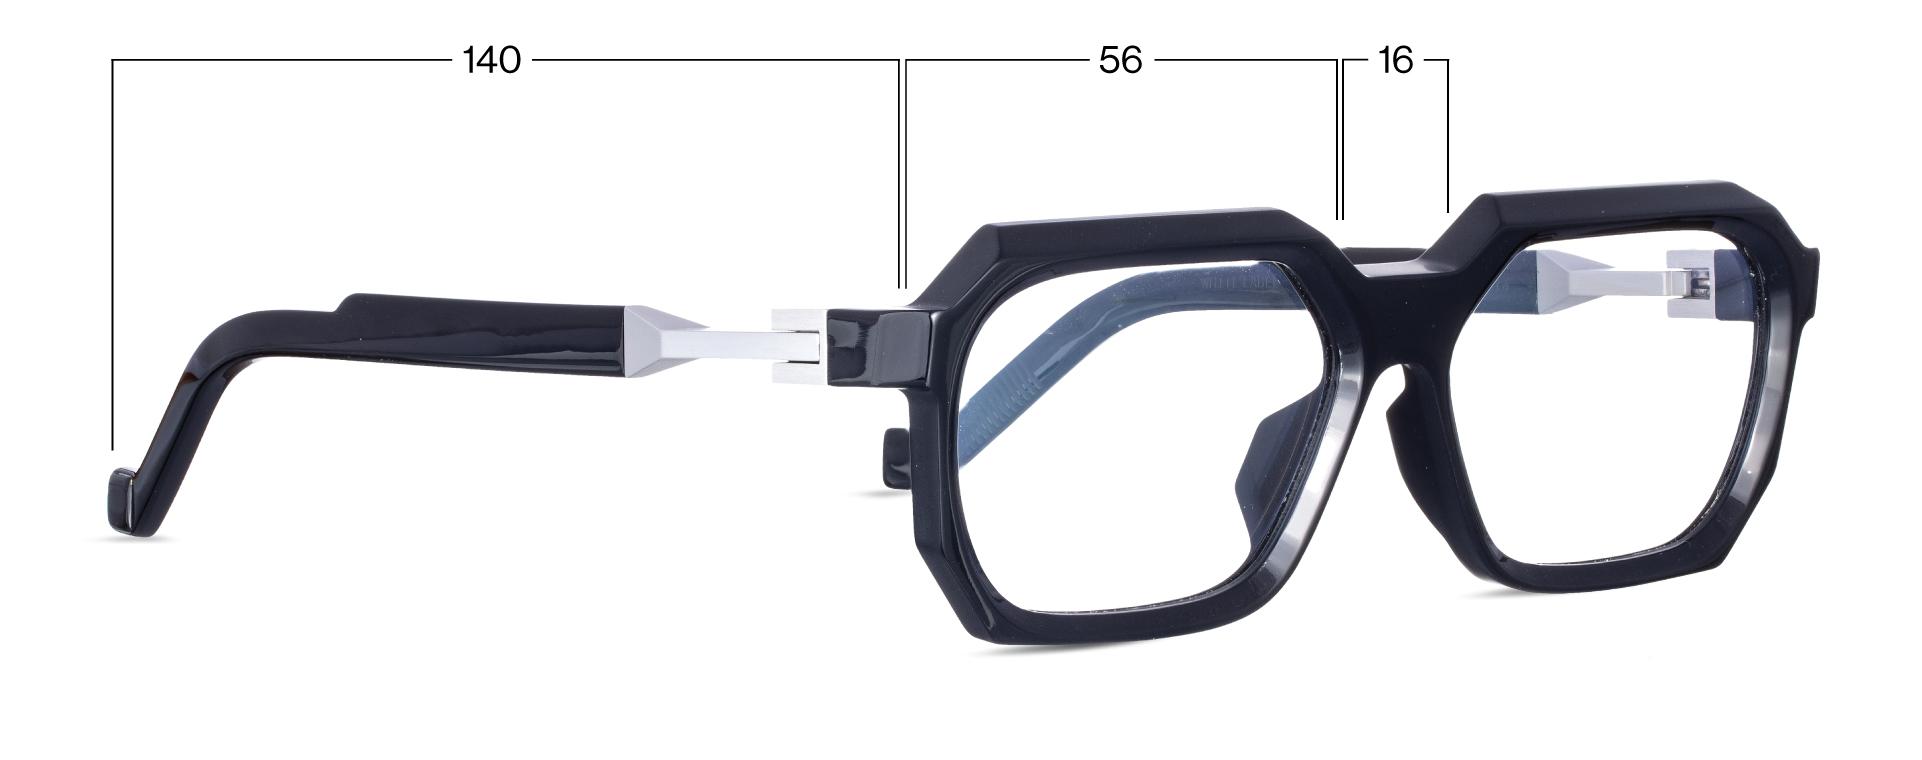 vava wl0048 black eyewear frame shop online